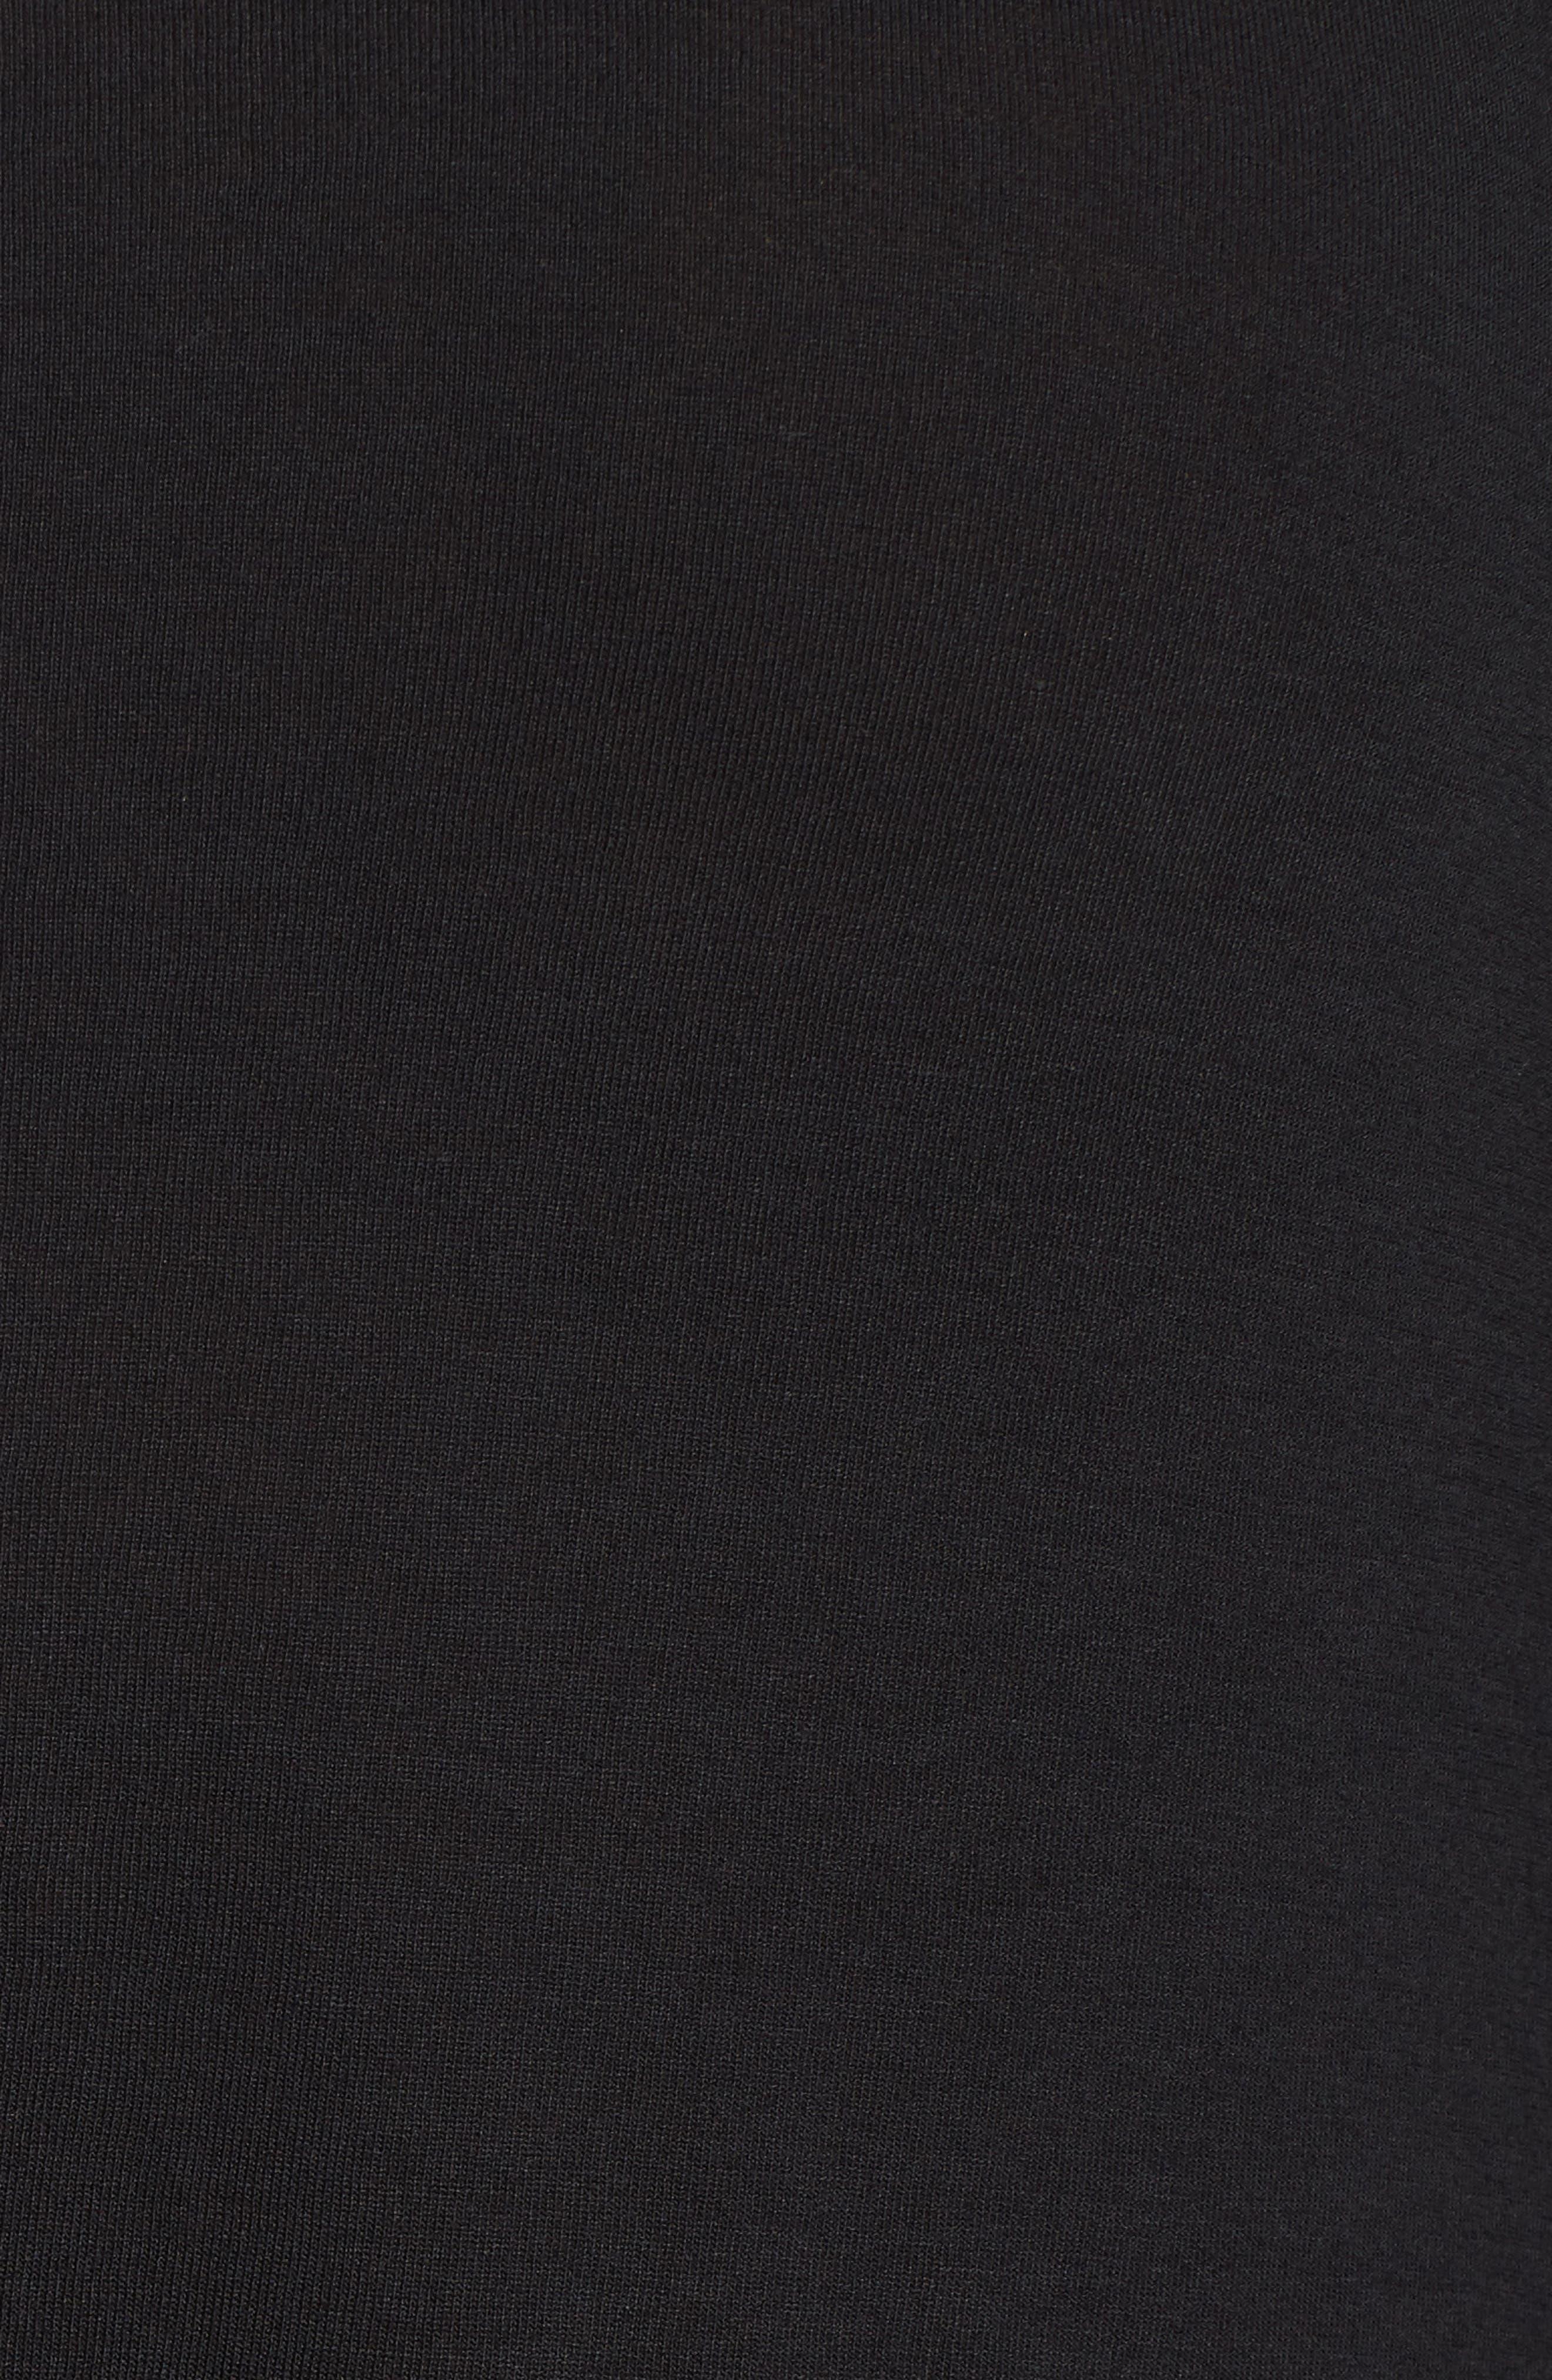 Sleeveless High/Low Knit Maxi Dress,                             Alternate thumbnail 6, color,                             001